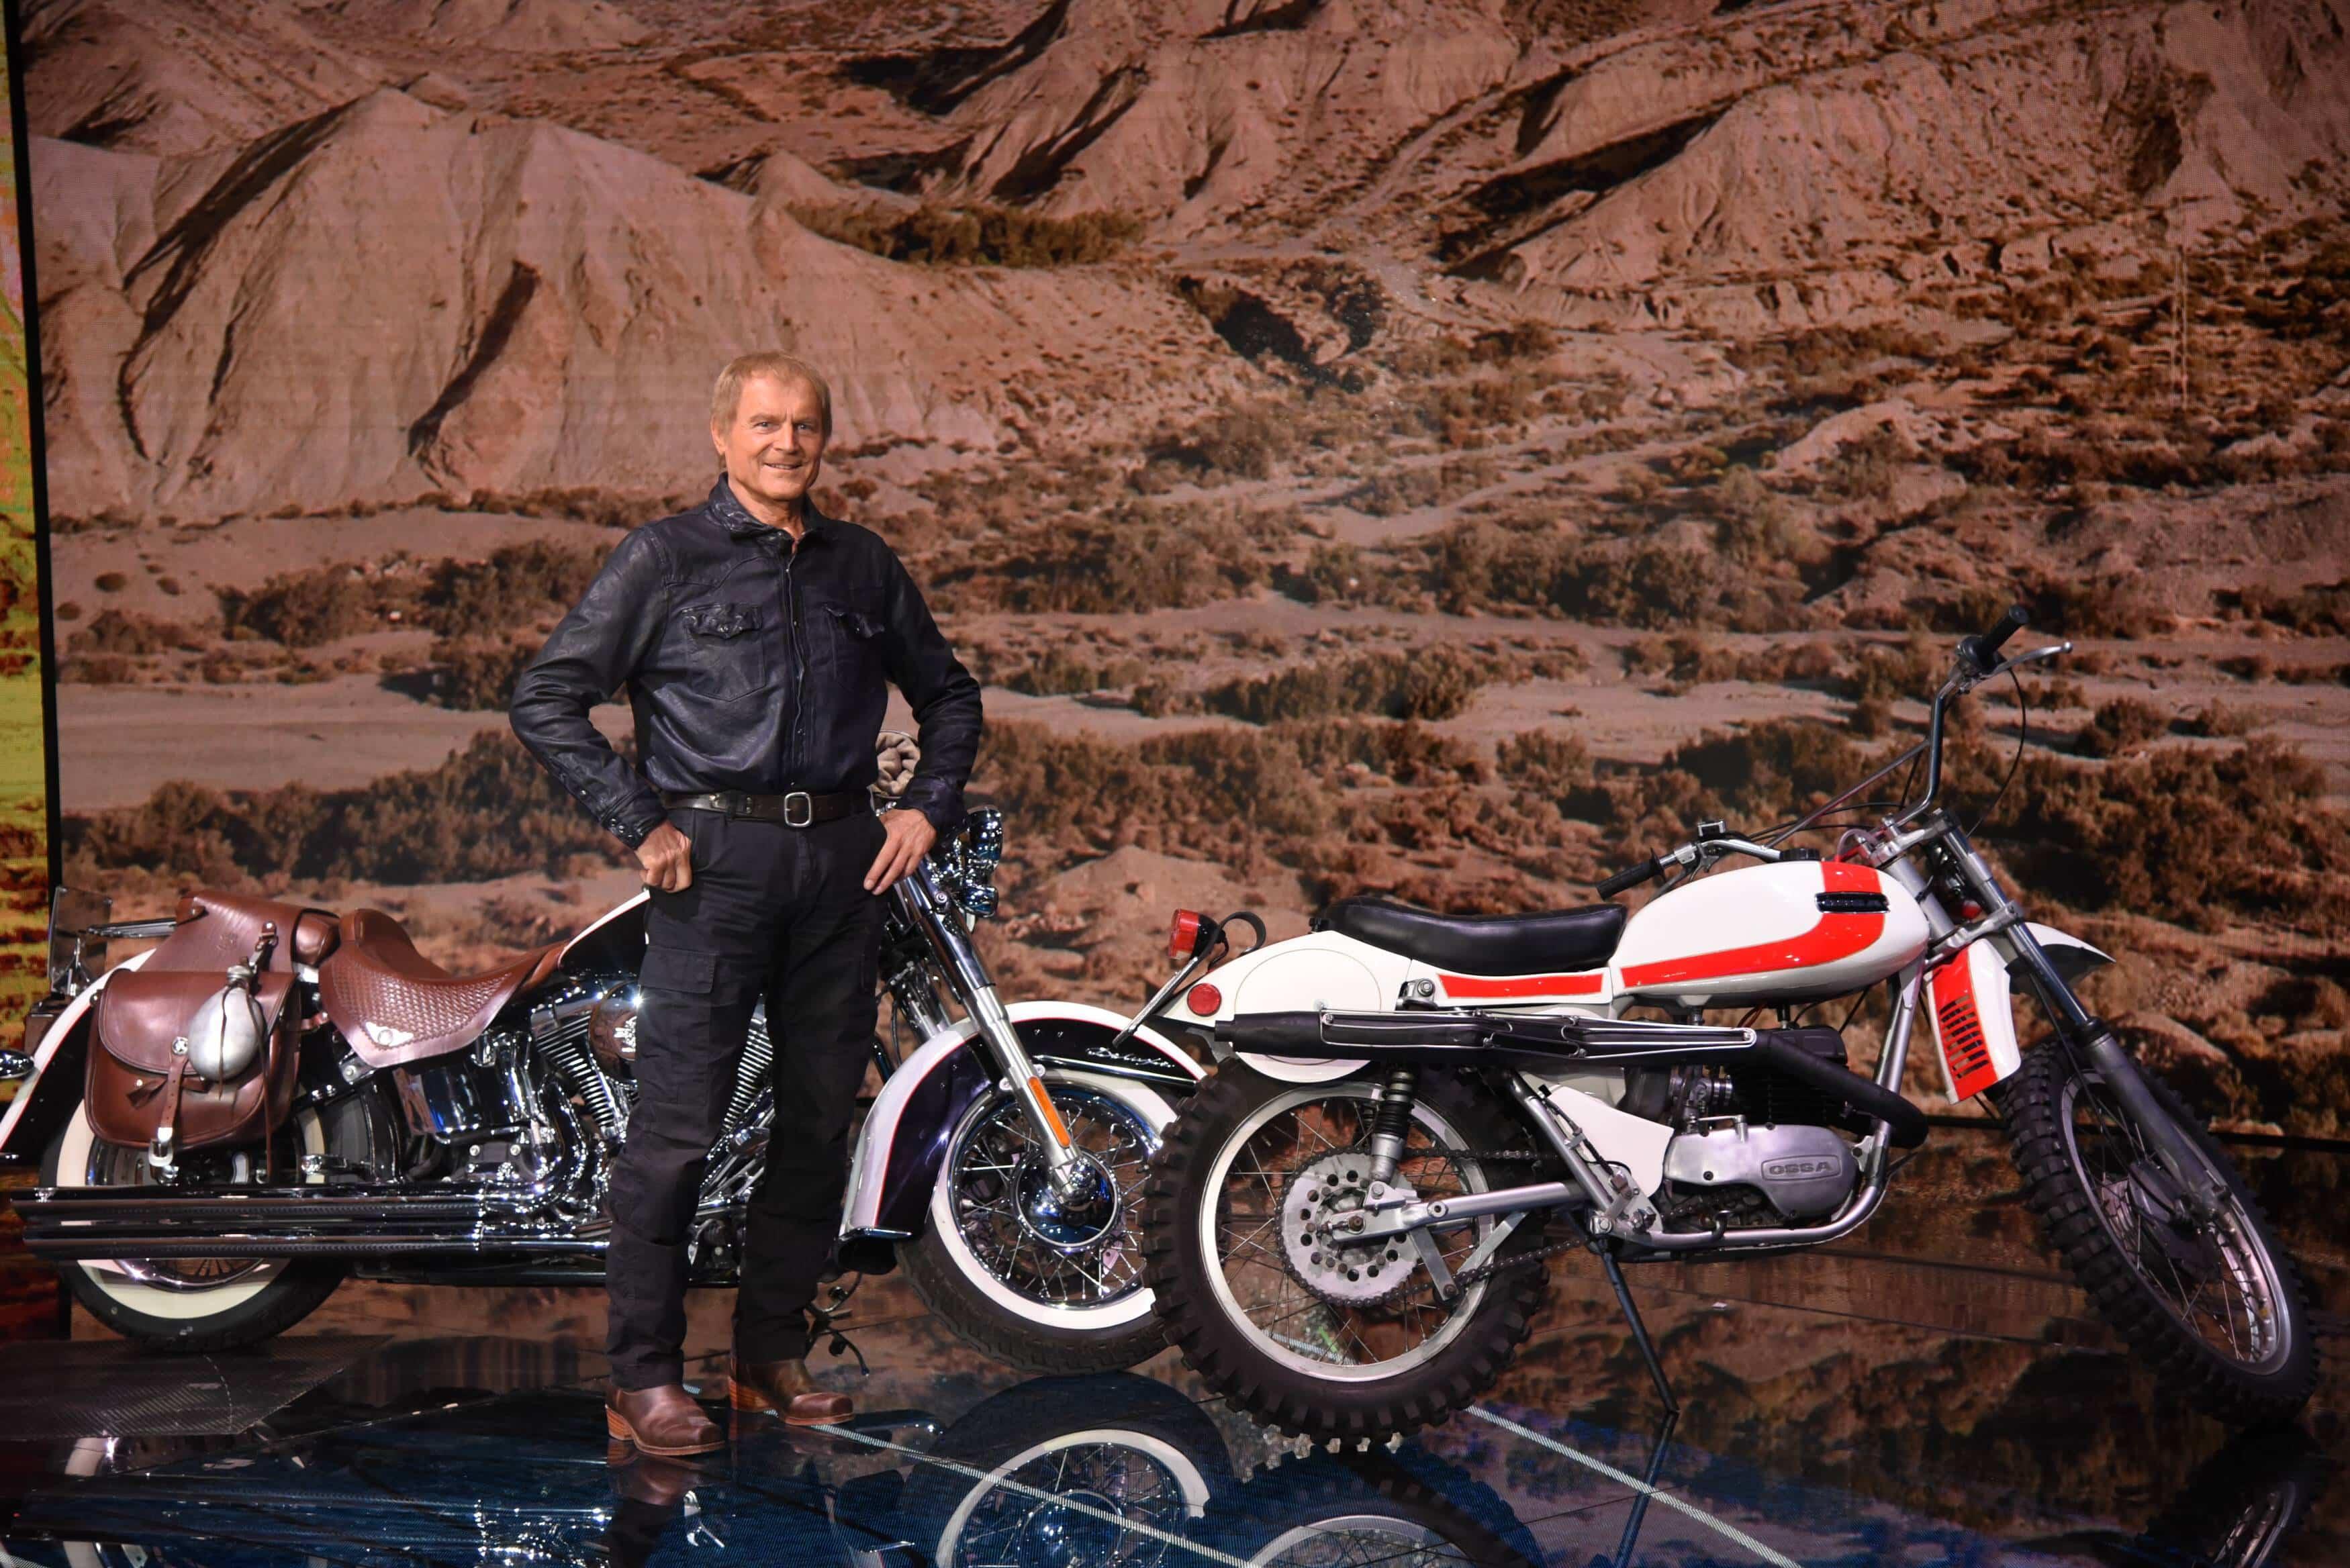 Terence Hill mit seinem Motorrad / Harley